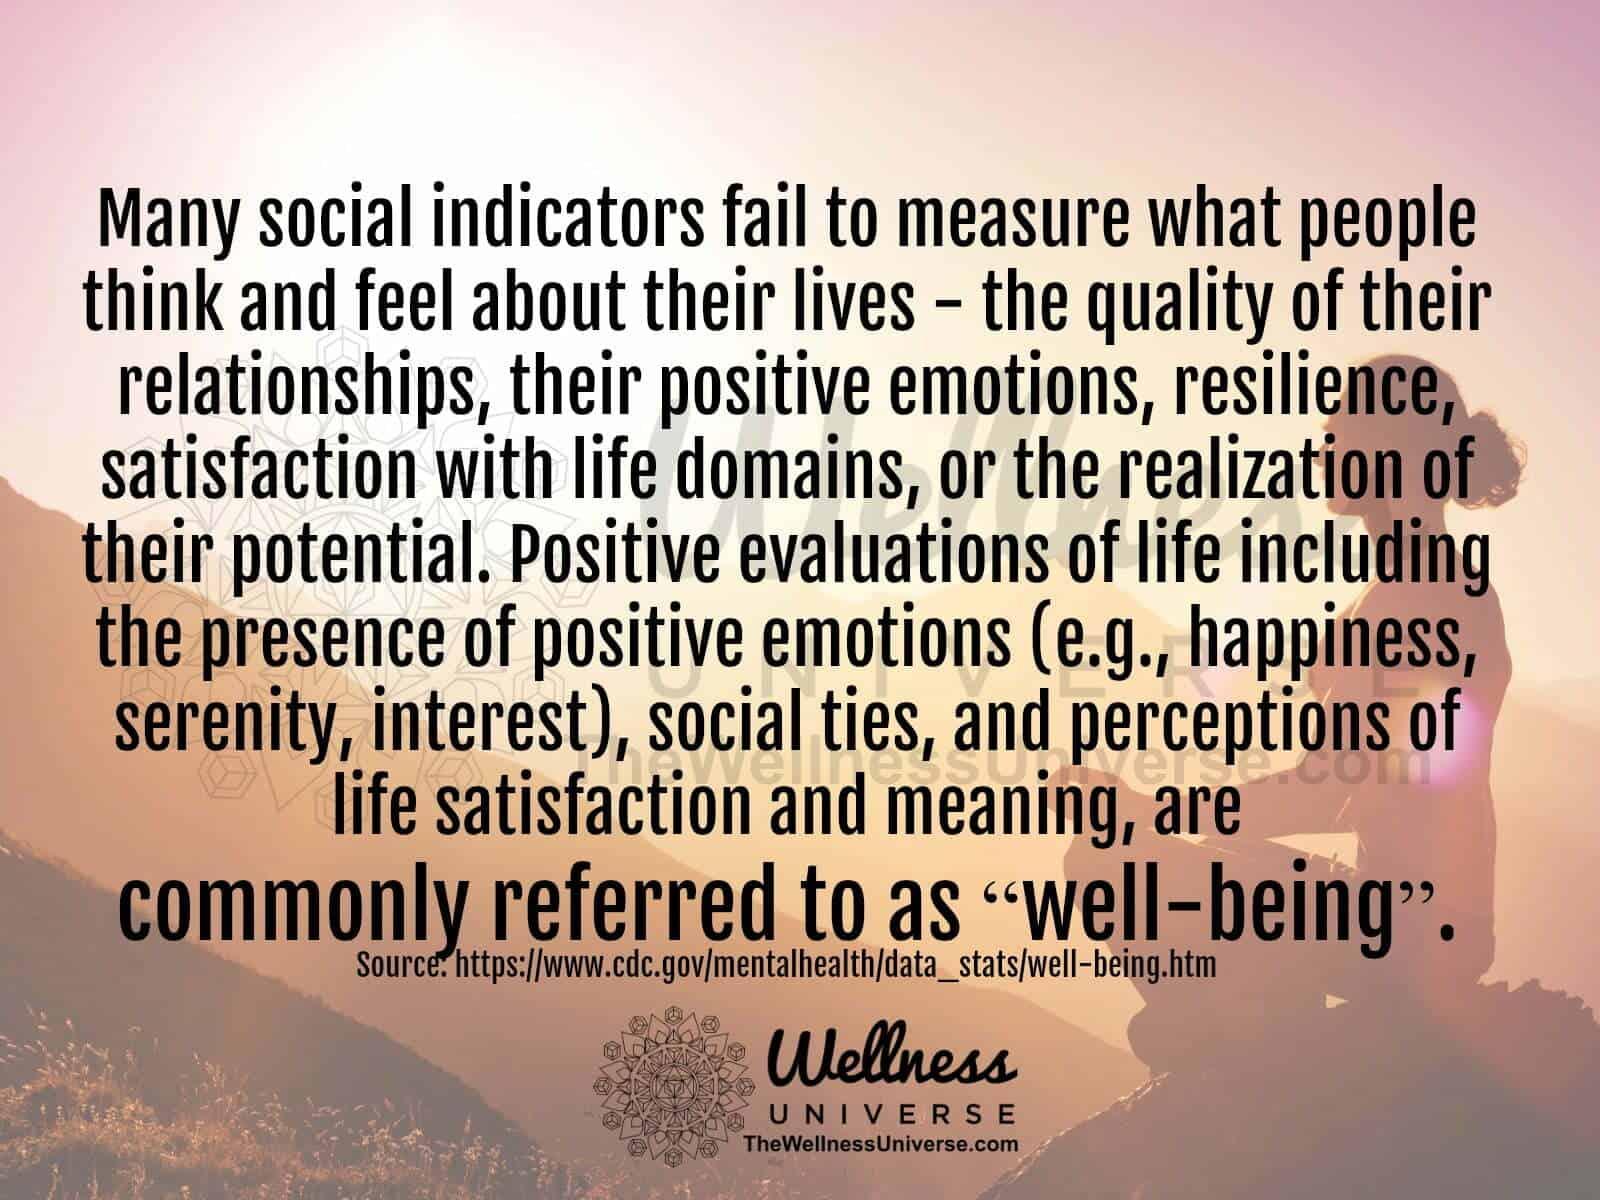 WU-wellbeing-post.jpg